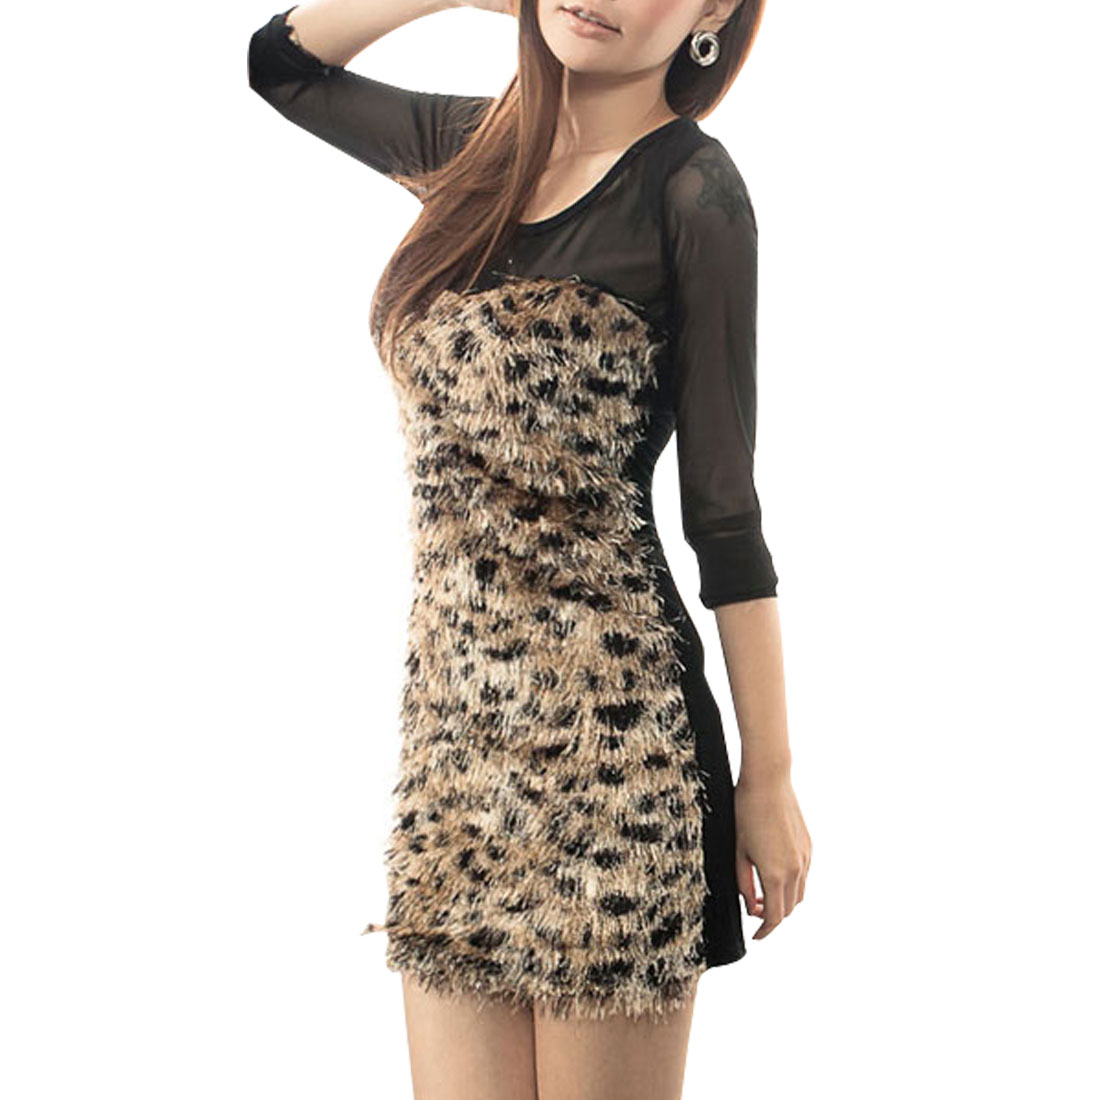 Pullover Black Sheer Long Sleeves Mini Dress Brown XS for Ladies